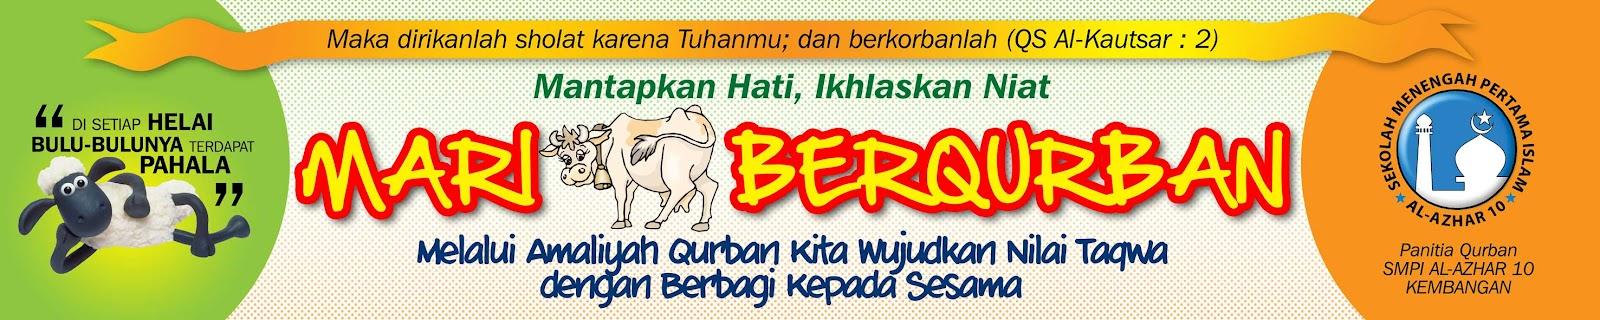 Contoh Spanduk Iedul Qurban